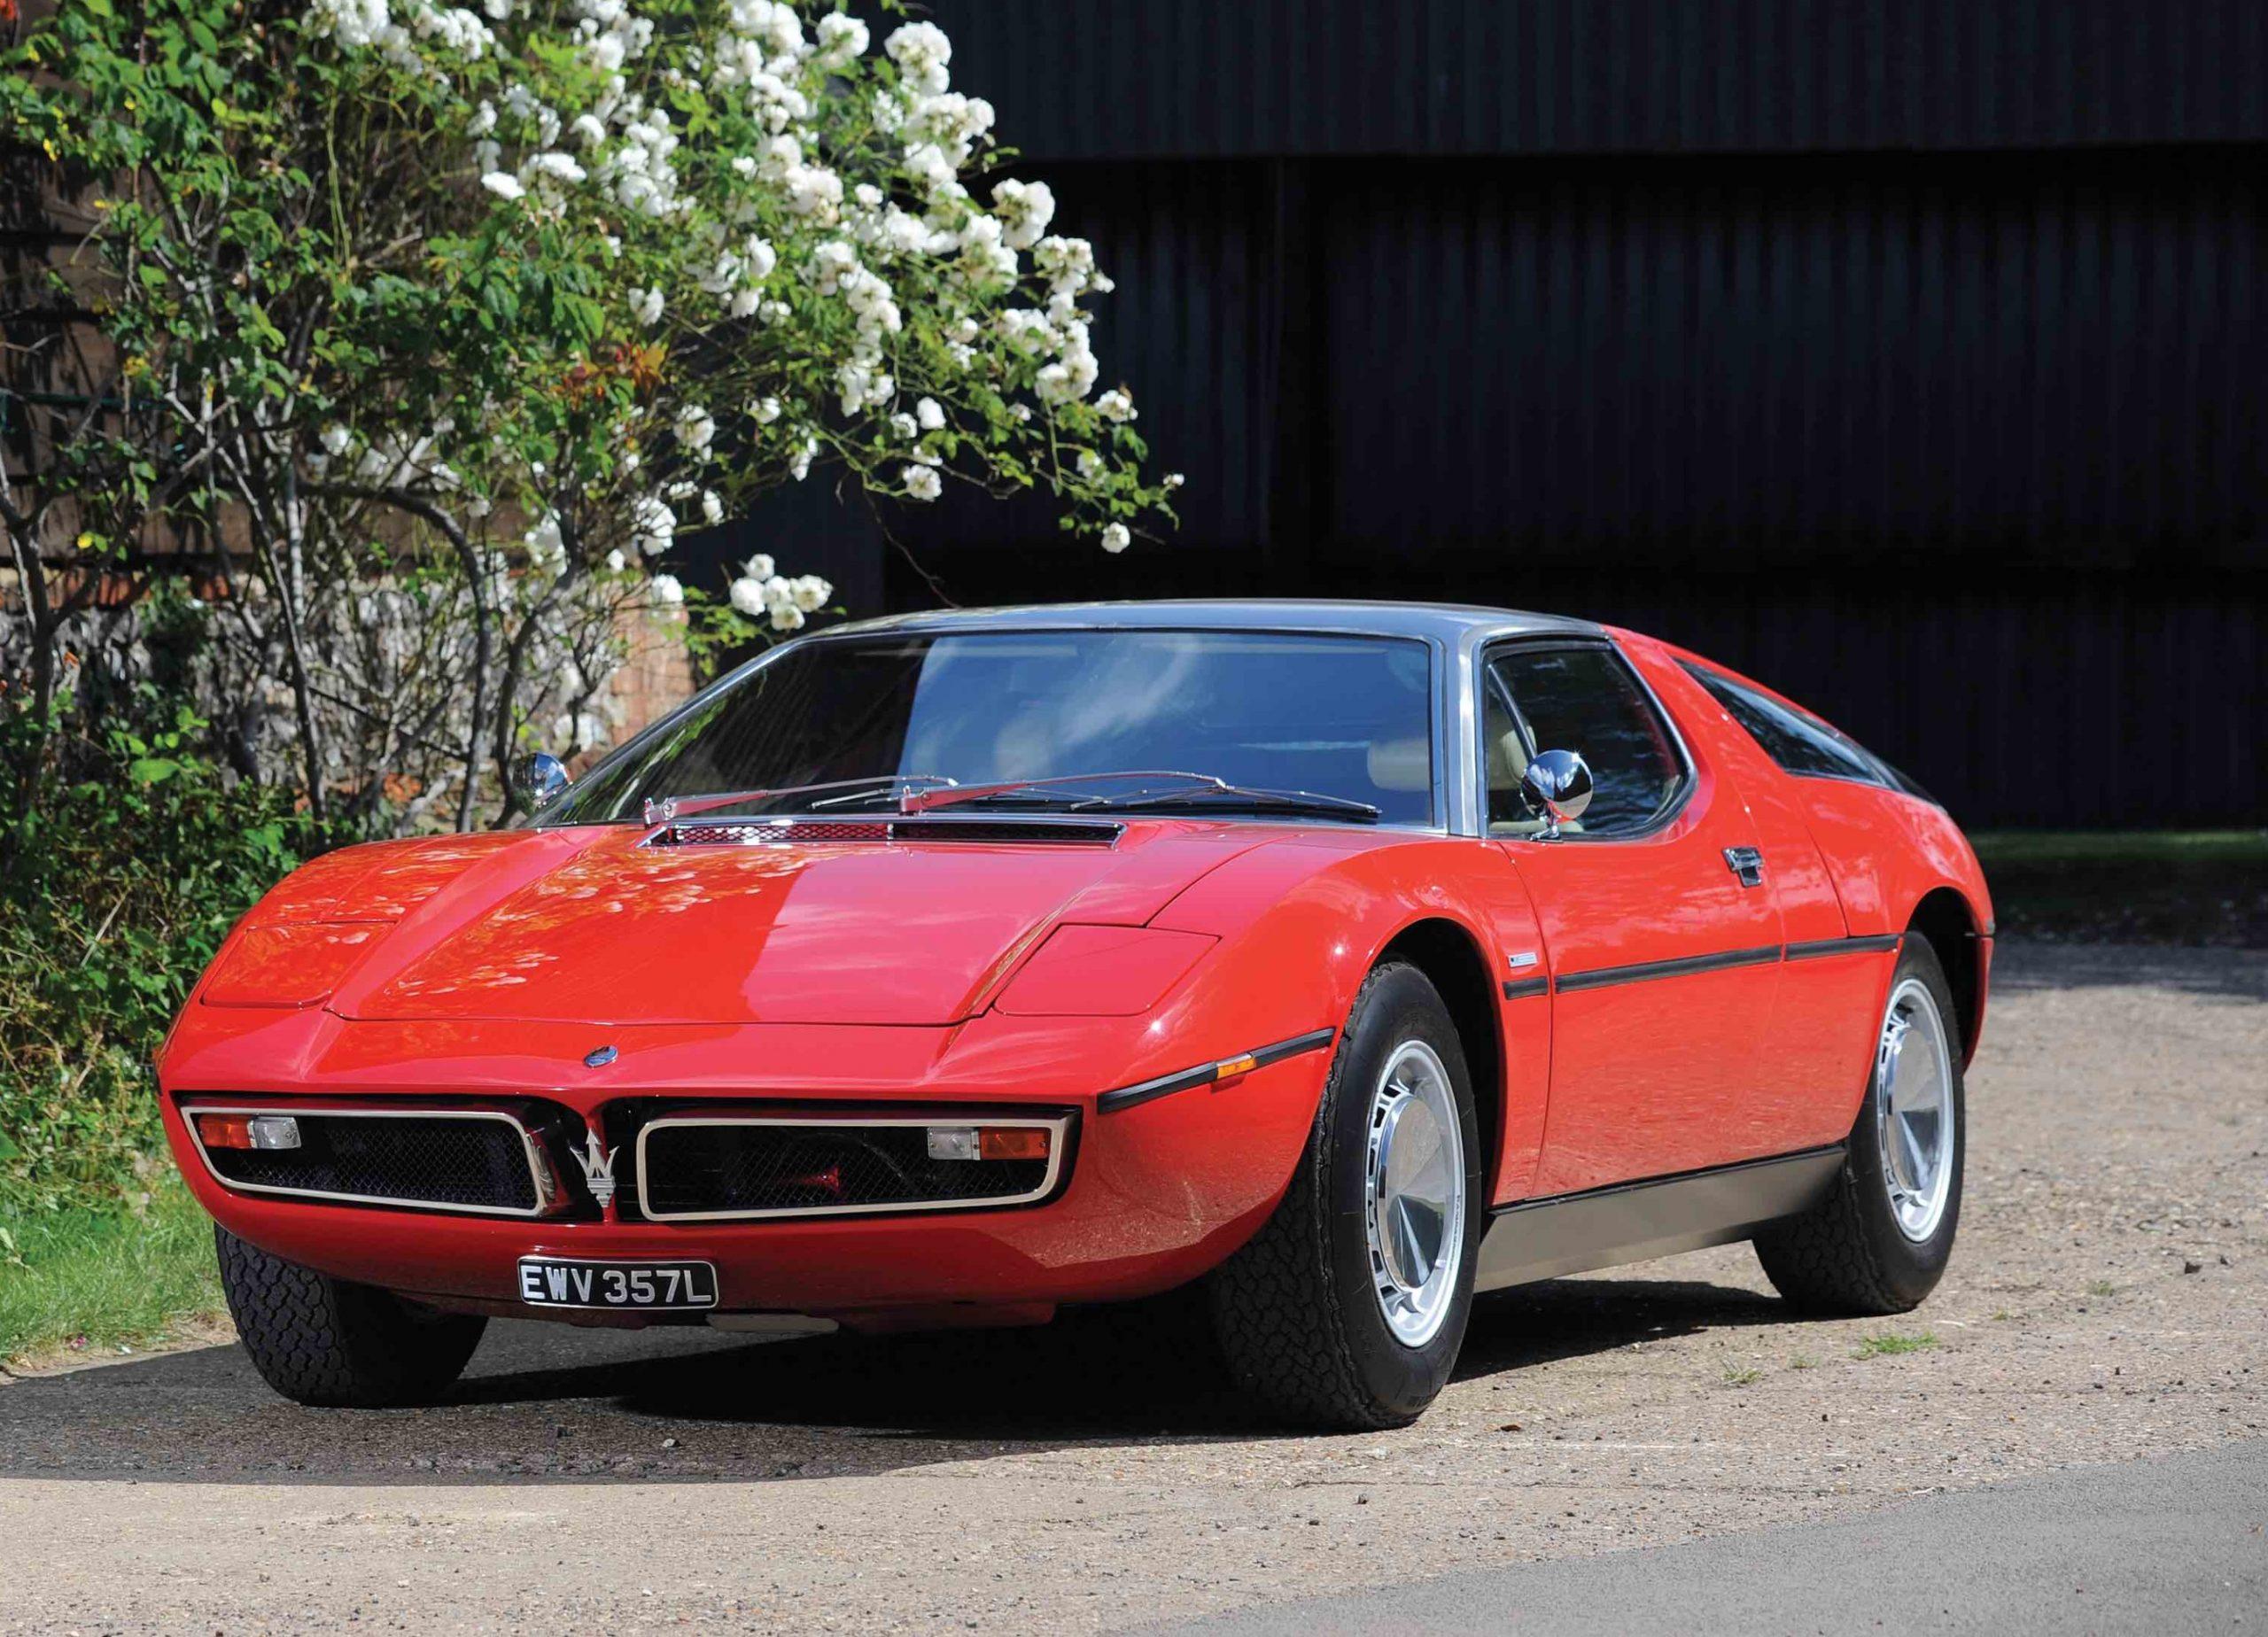 Top tridents: six magnificent Maseratis